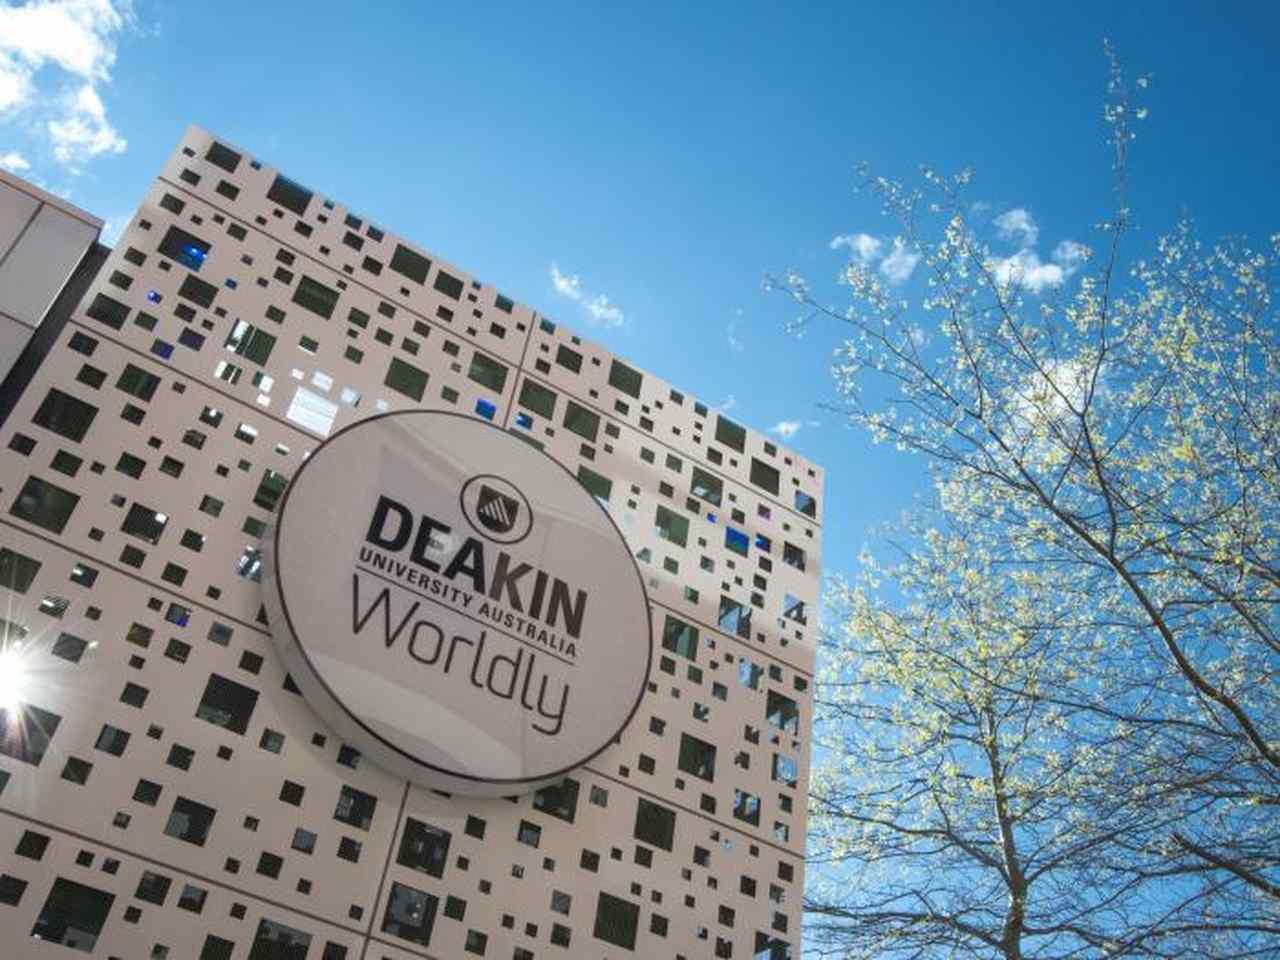 Sky, Daytime, Architecture, Font, Tree, Building, Cloud, Signage, Deakin University, Deakin University, Deakin Optometry, University, Student, Higher Education, Public university